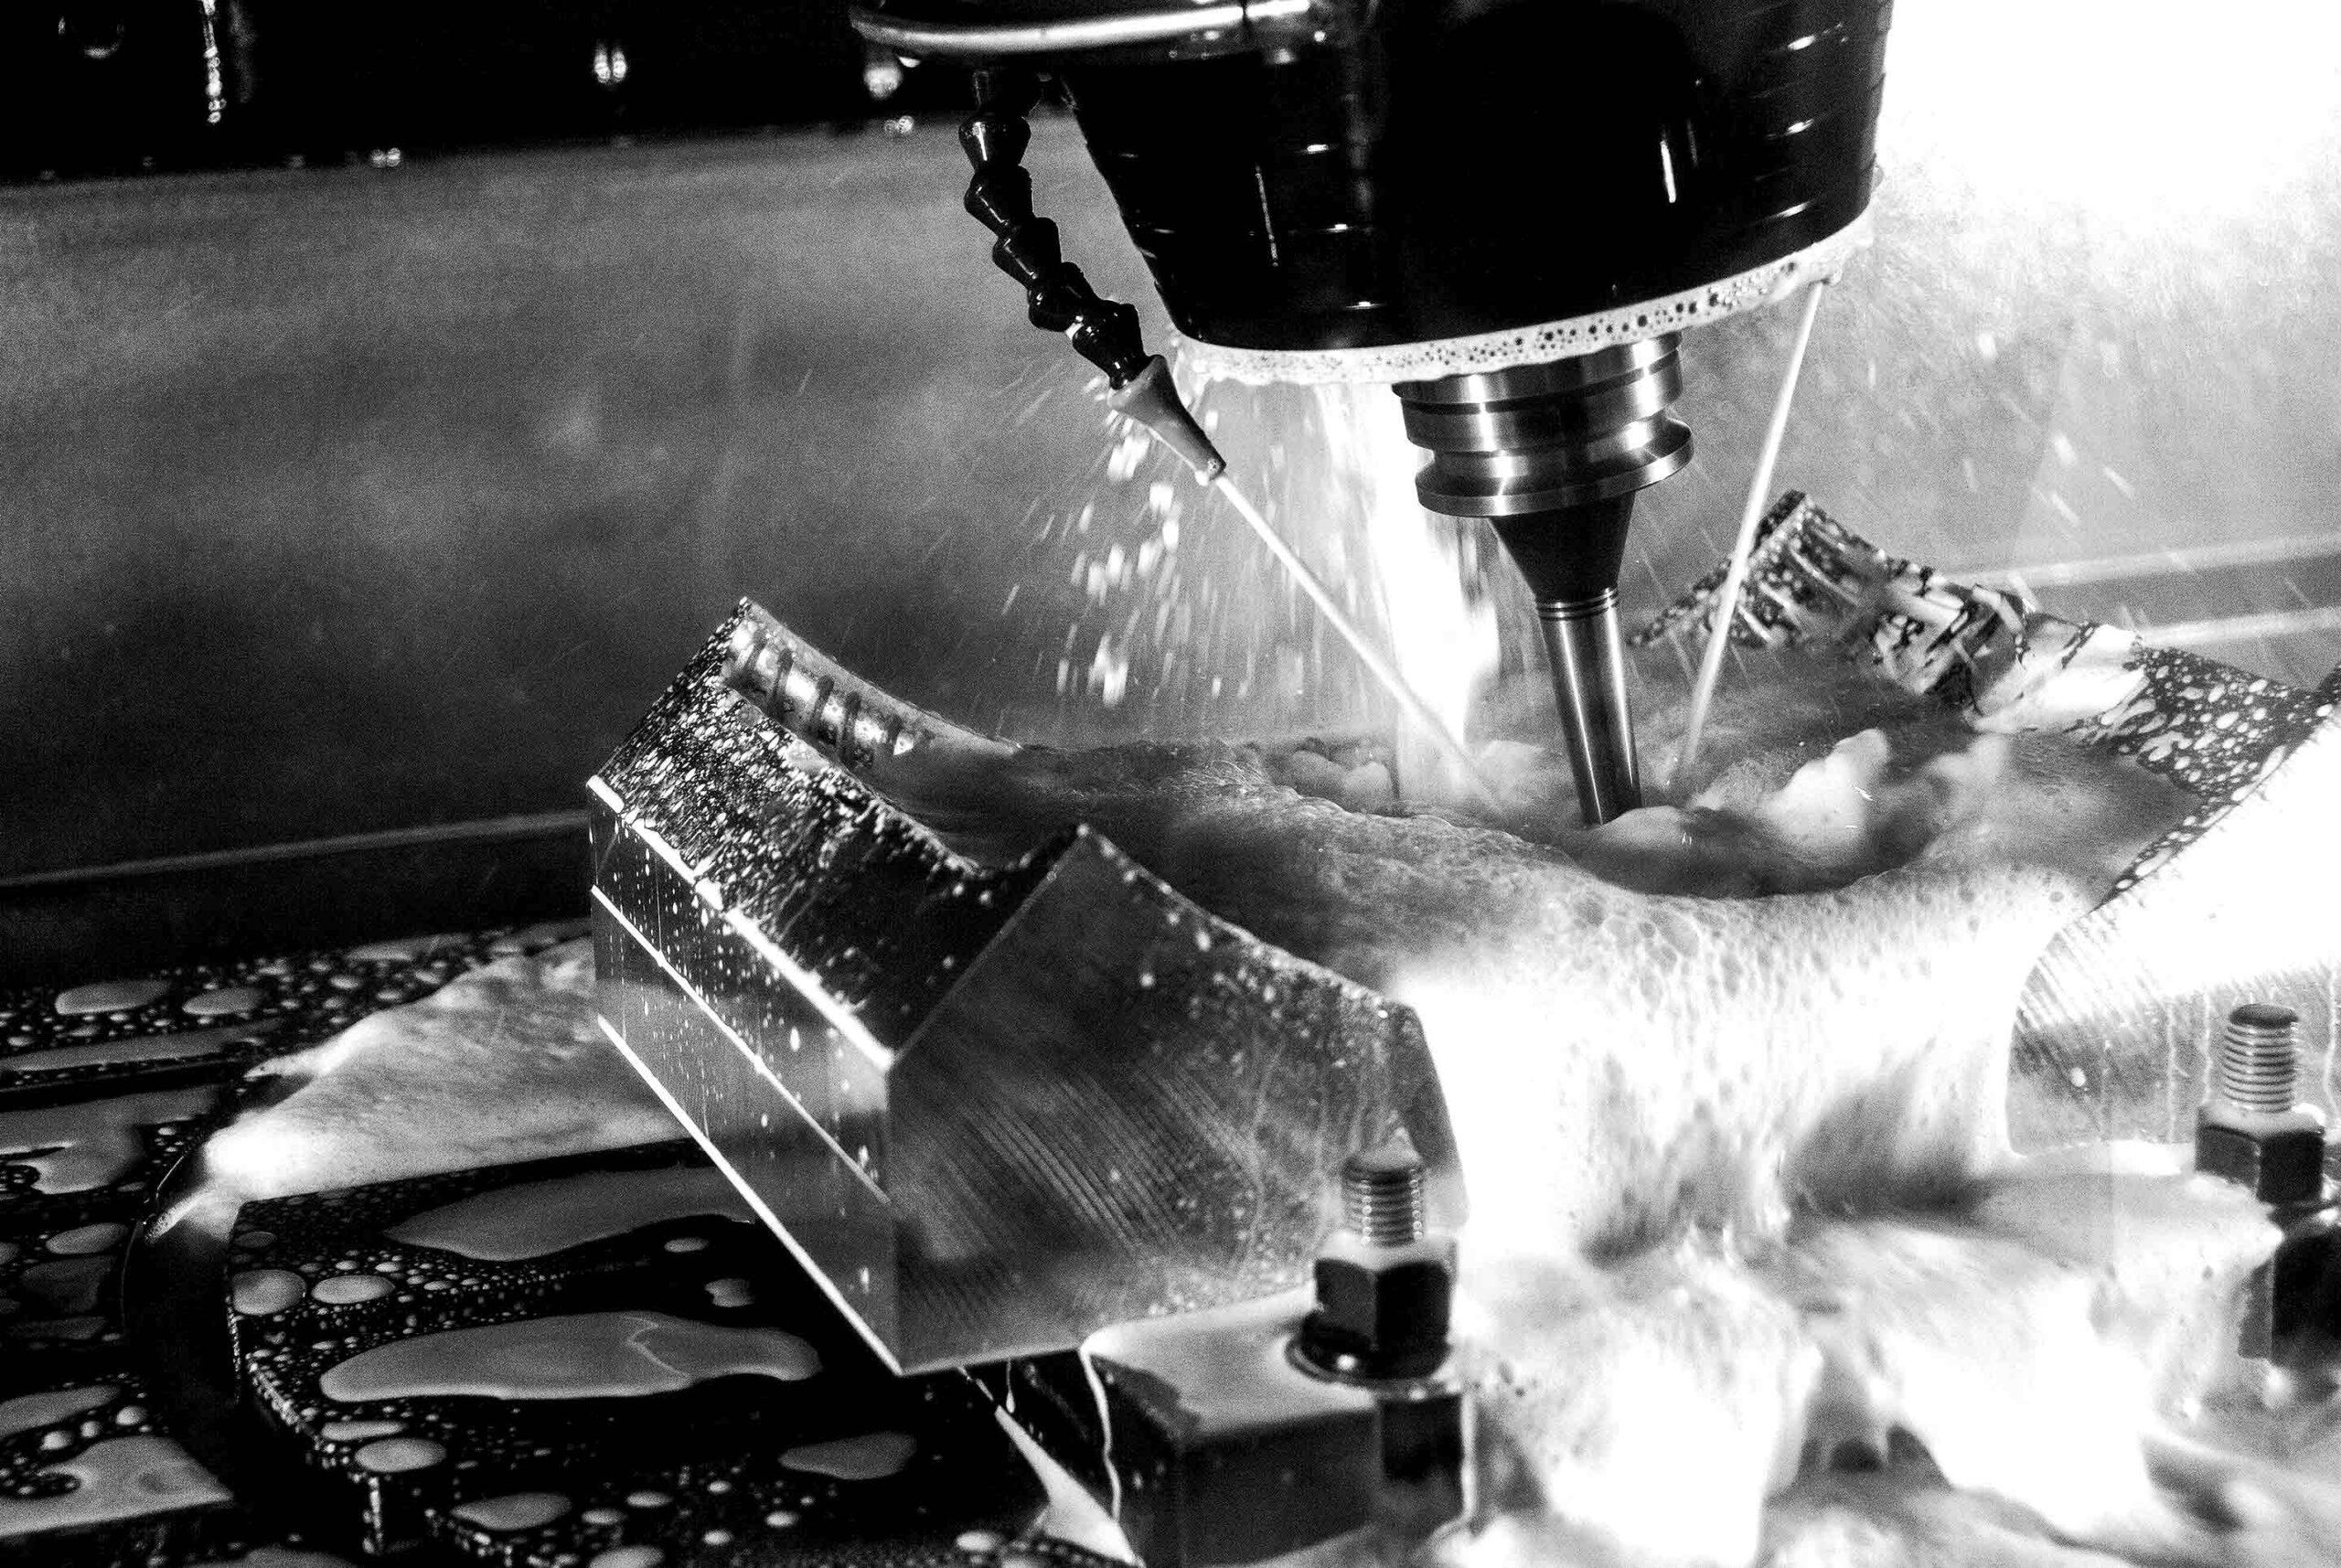 Manutenzione macchine utensili.